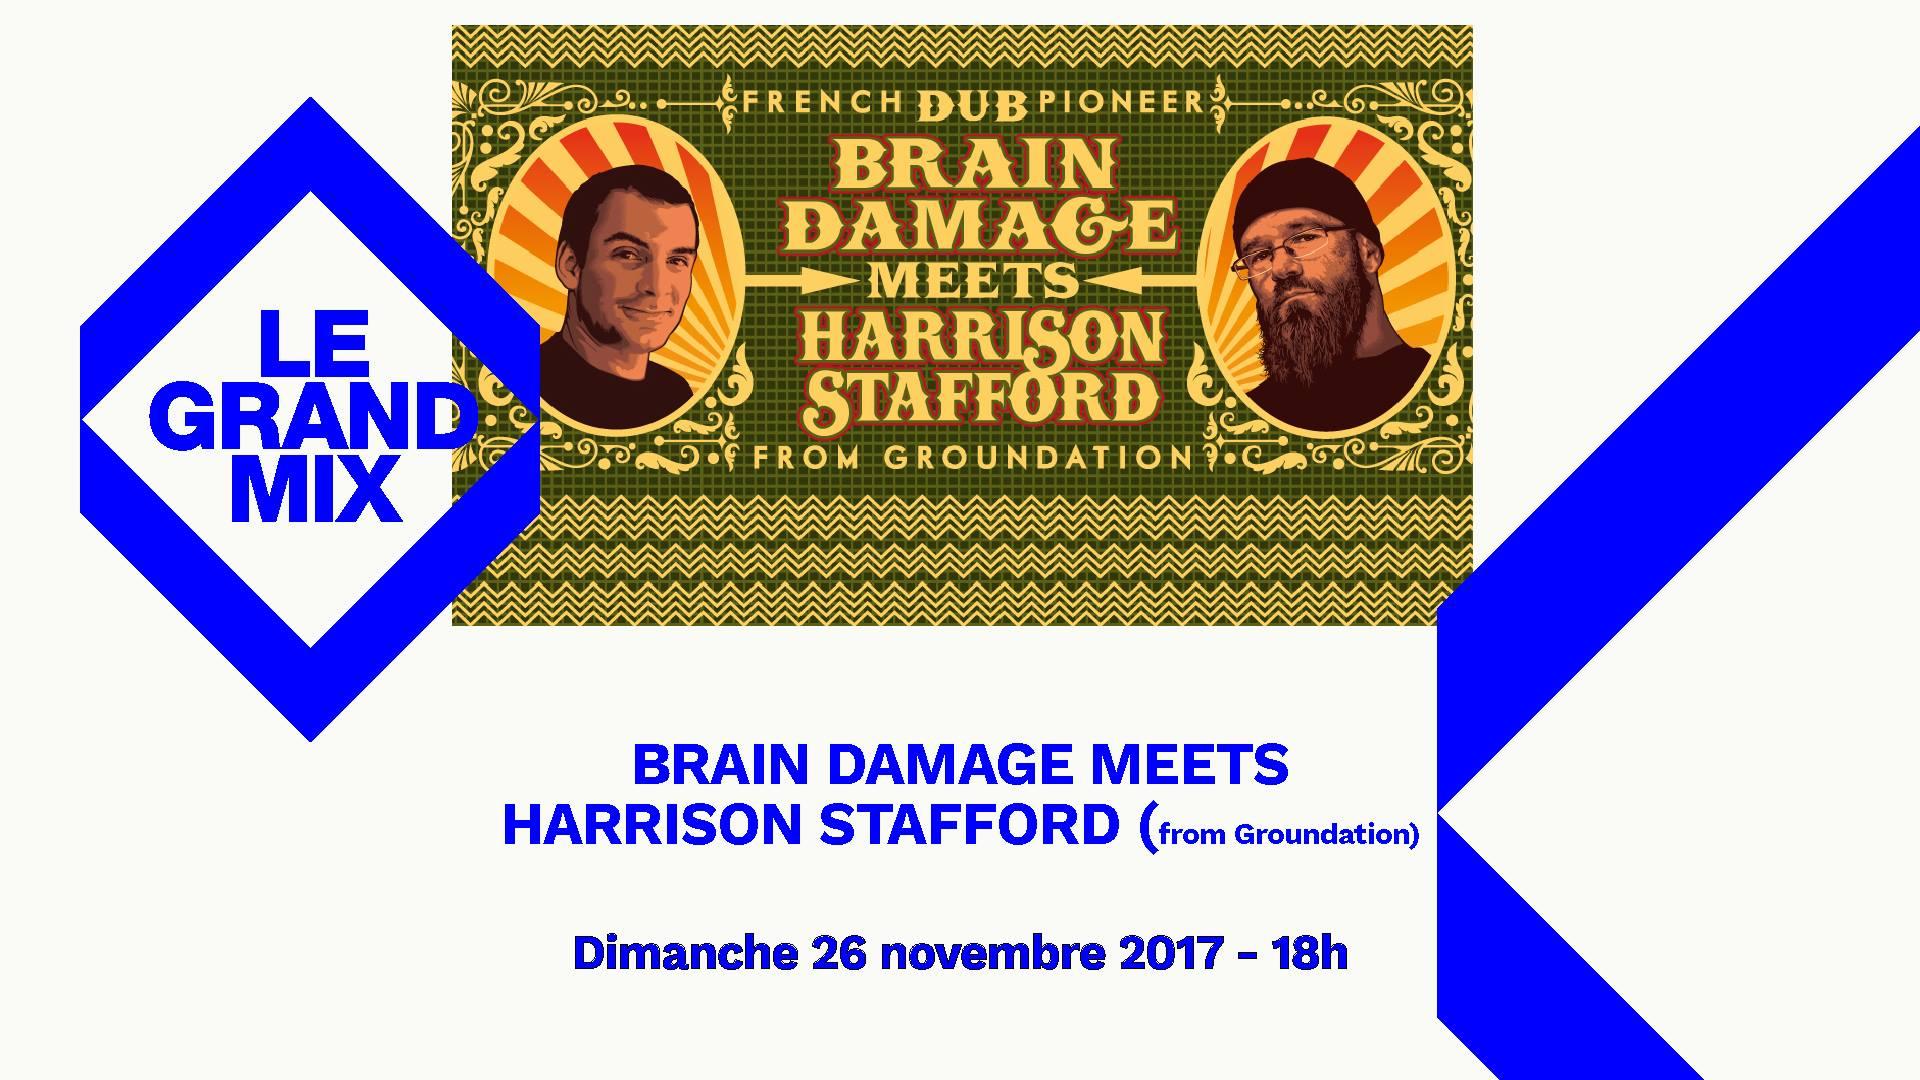 Brain Damage meets Harrison Stafford